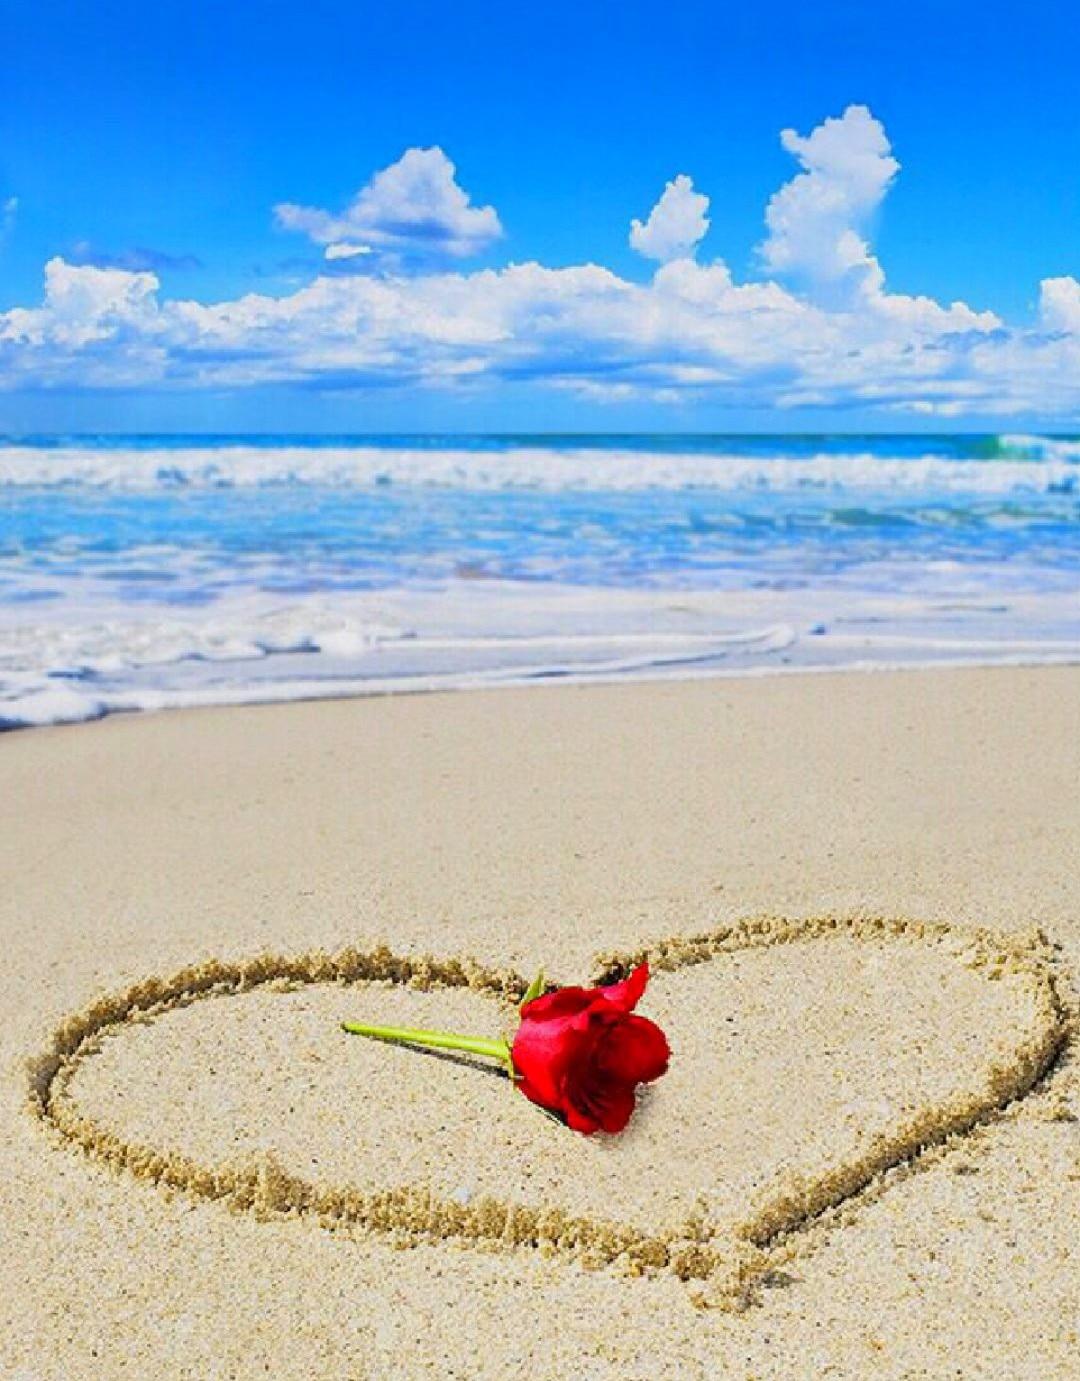 JMINE Div 5D mar playa flor corazón Rosa pintura completa diamante punto de cruz kits de Arte de boda 3D pintura por diamantes